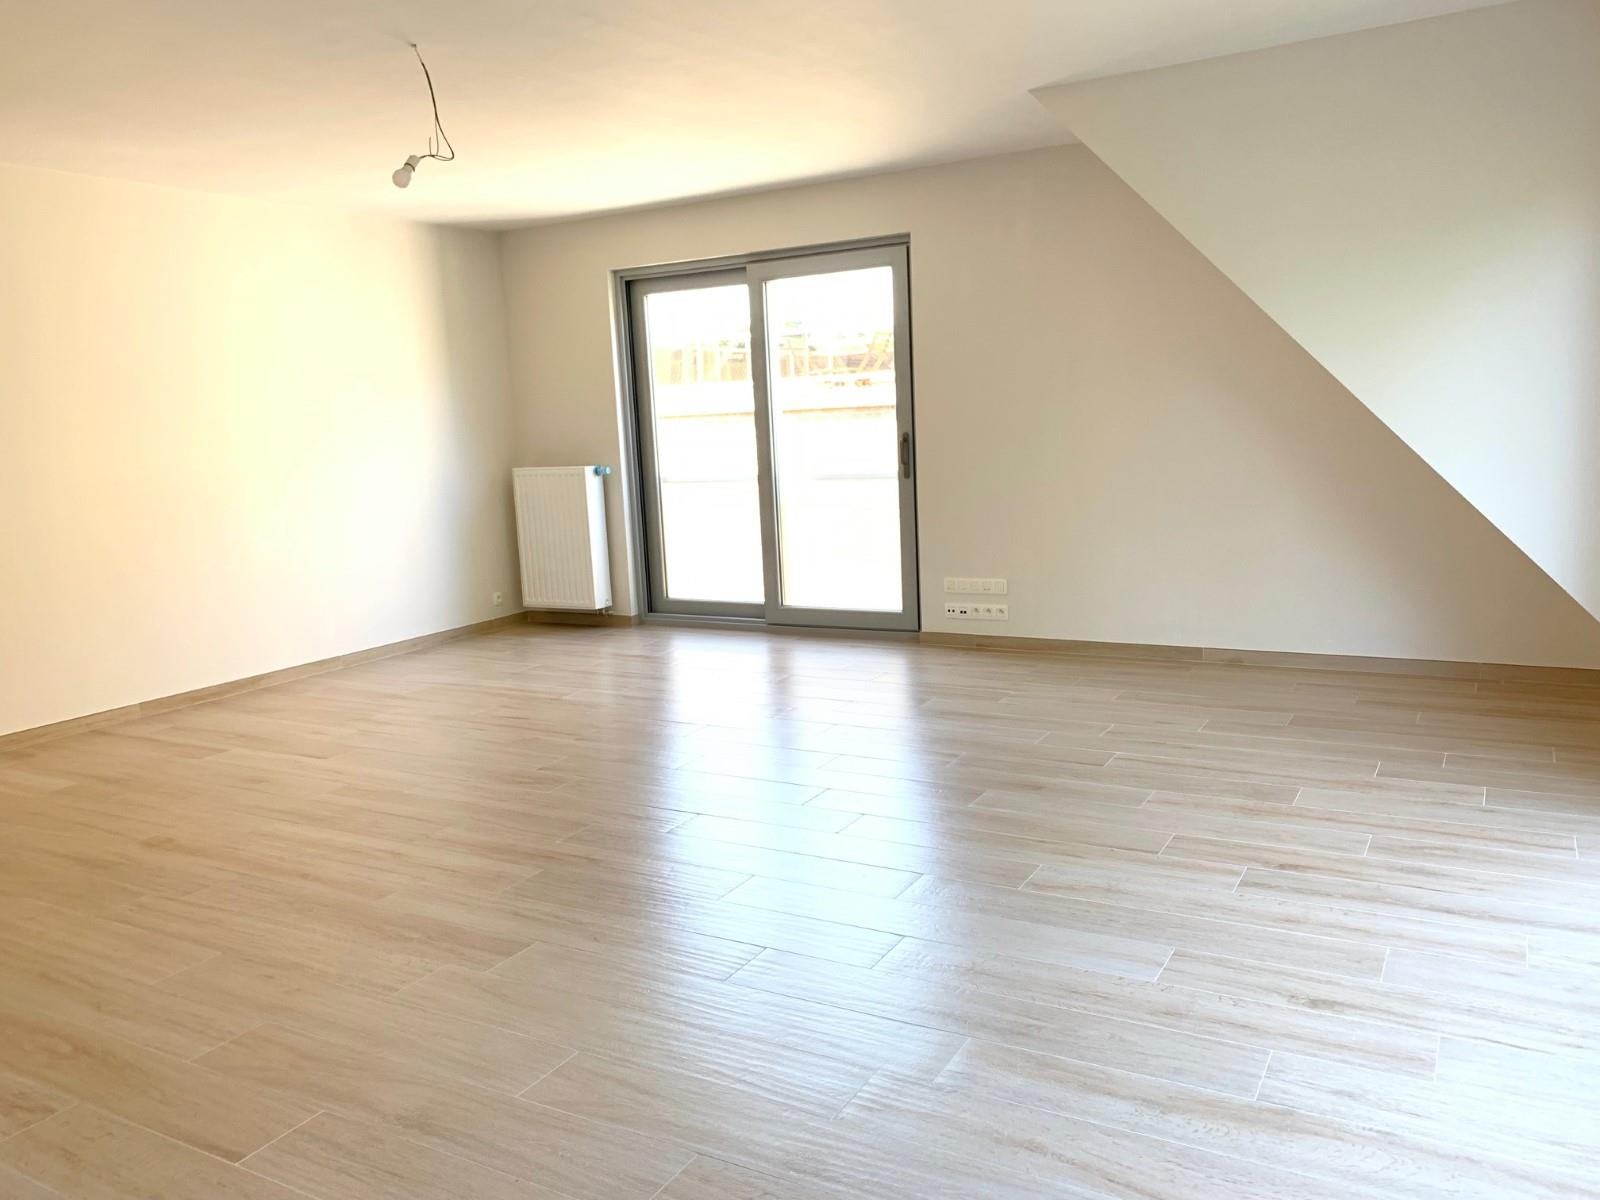 Duplex - Woluwe-Saint-Lambert - #3798385-2